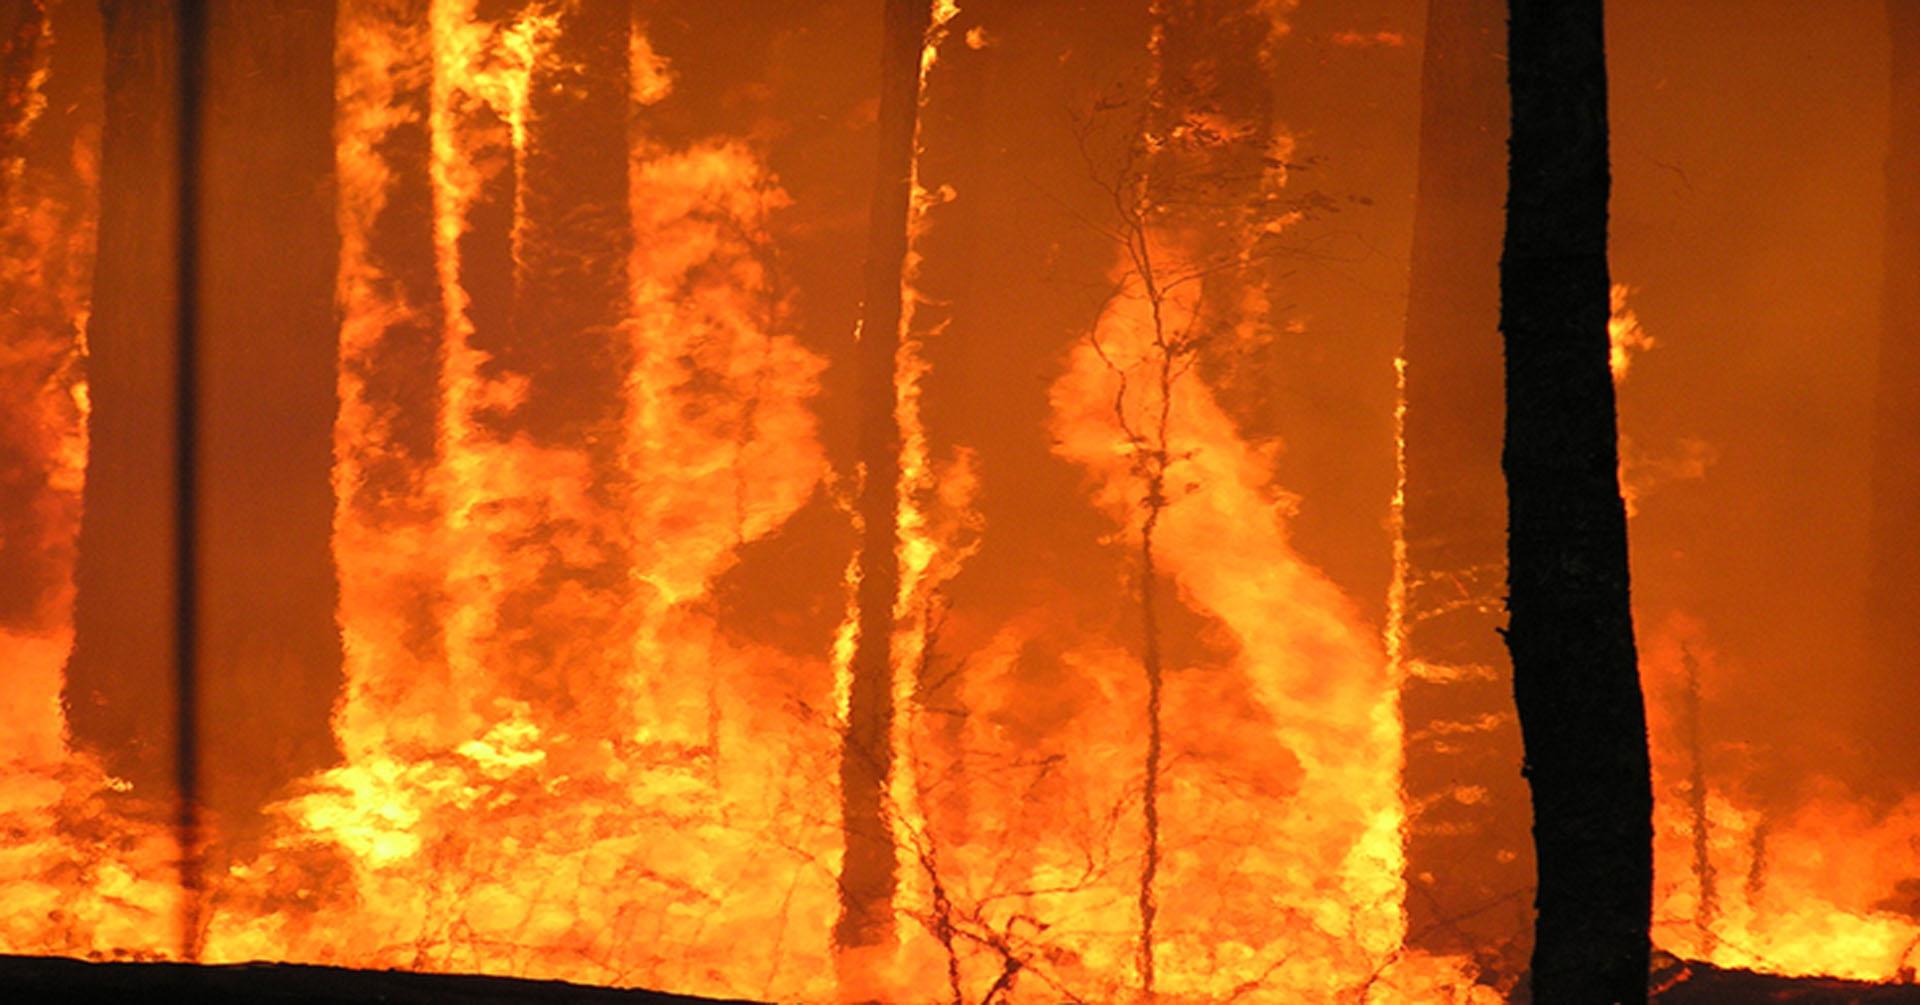 bushfire - photo #36